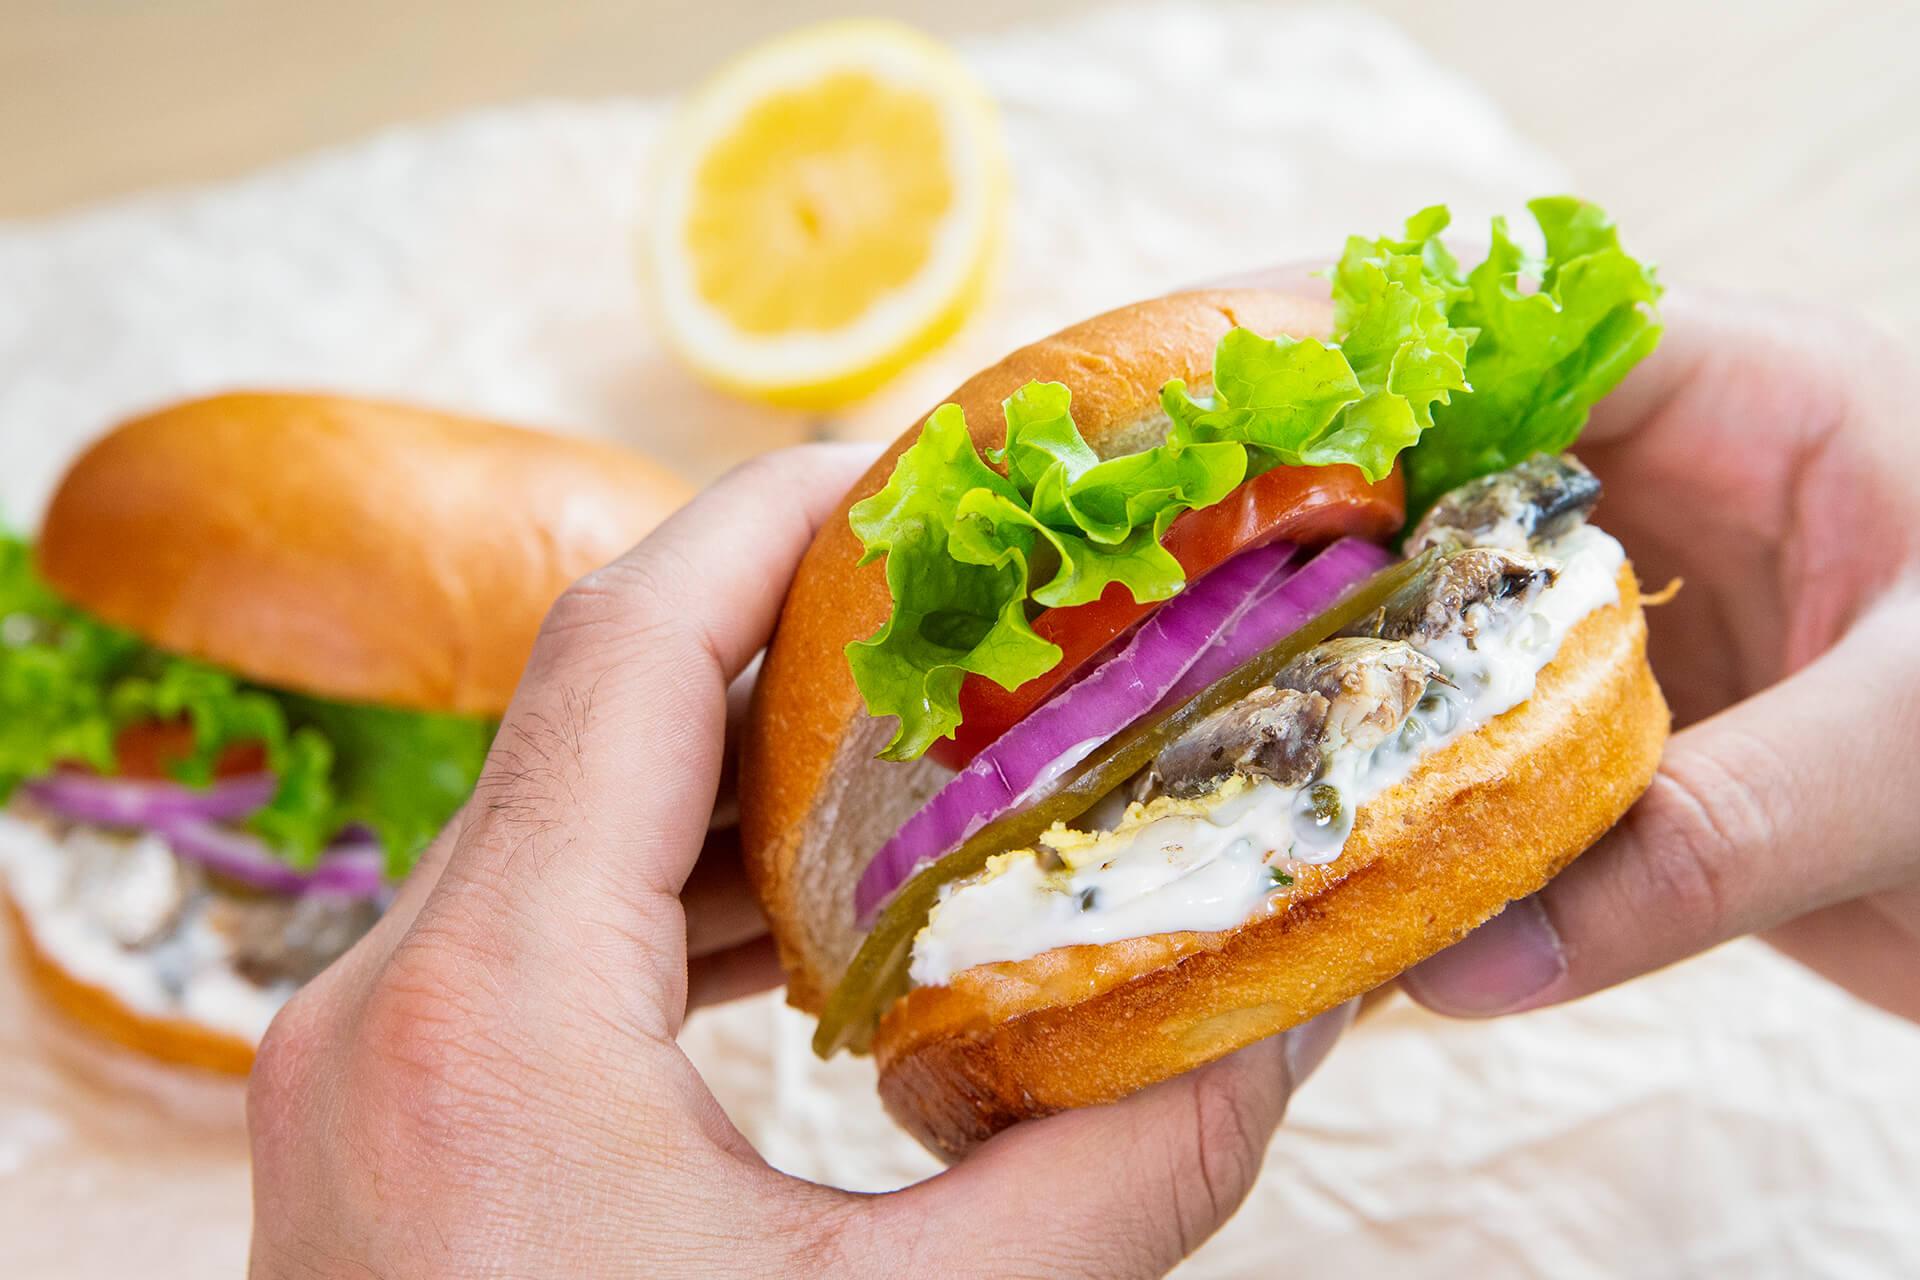 Sardine and Egg Sandwich